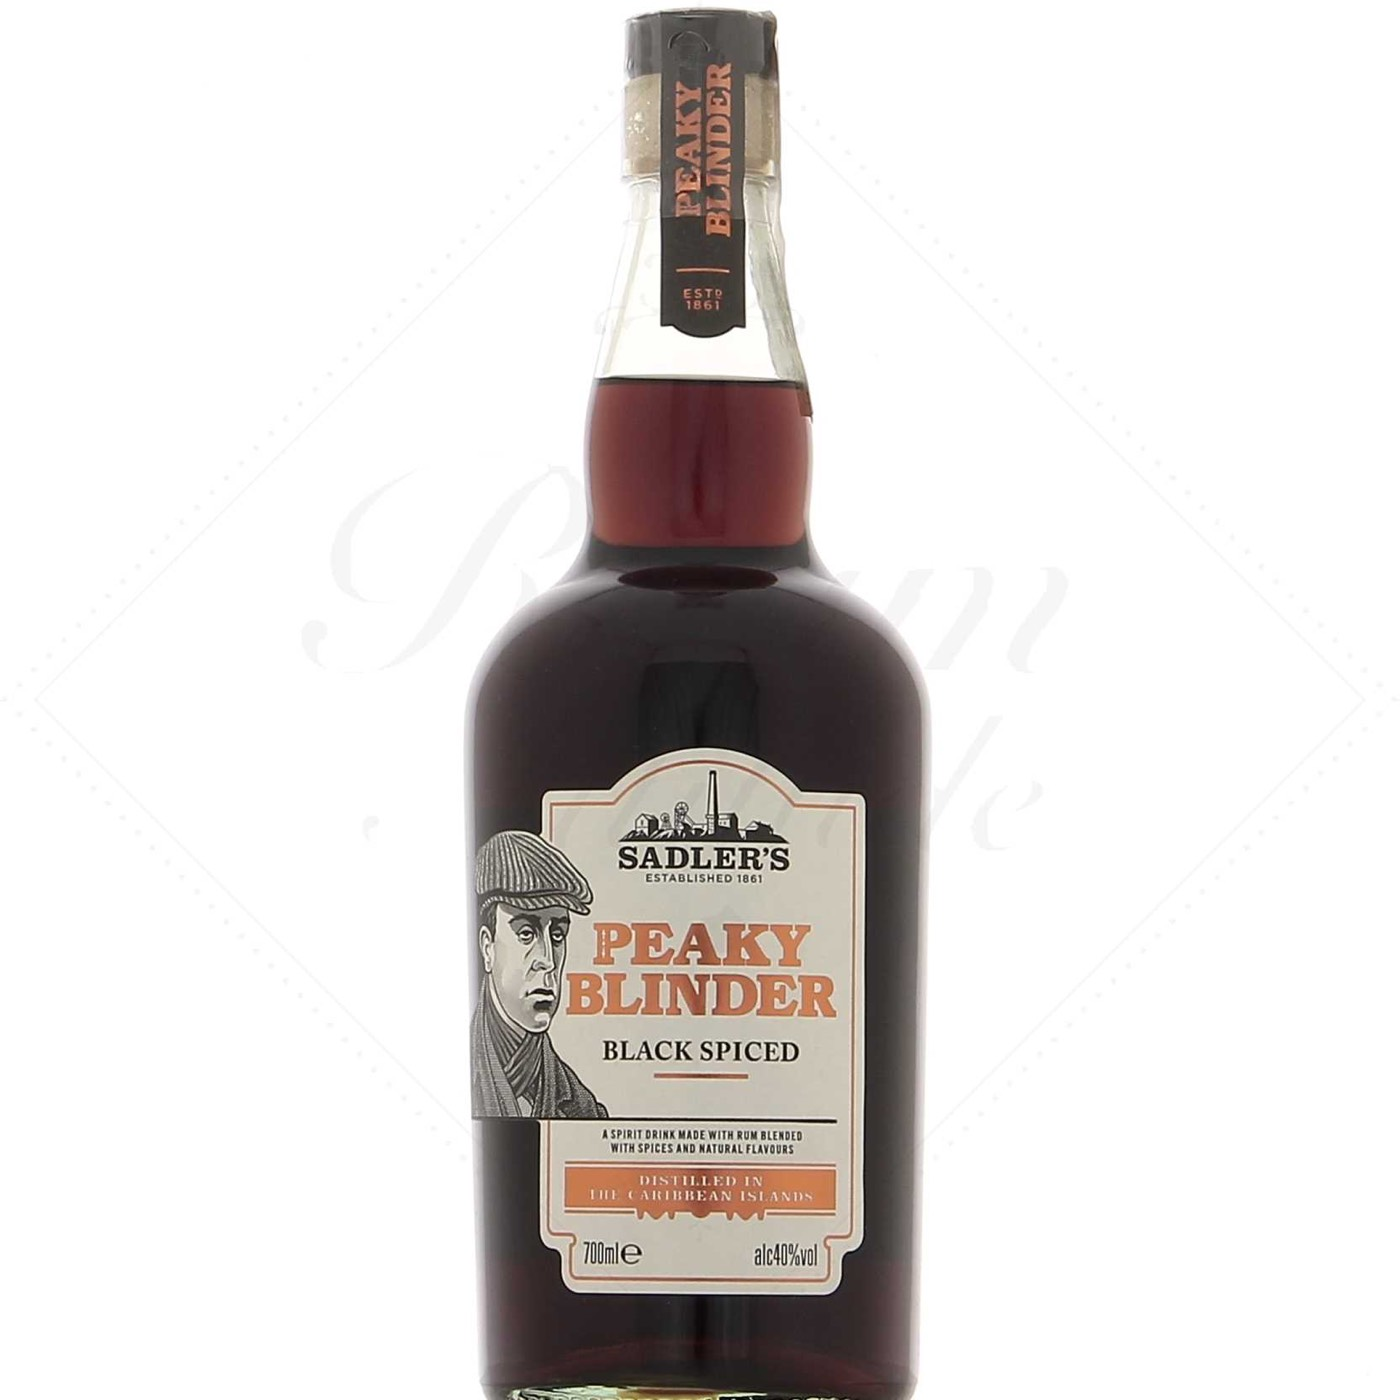 Bottle image of Saddlers Peaky Blinder Black Spiced Rum